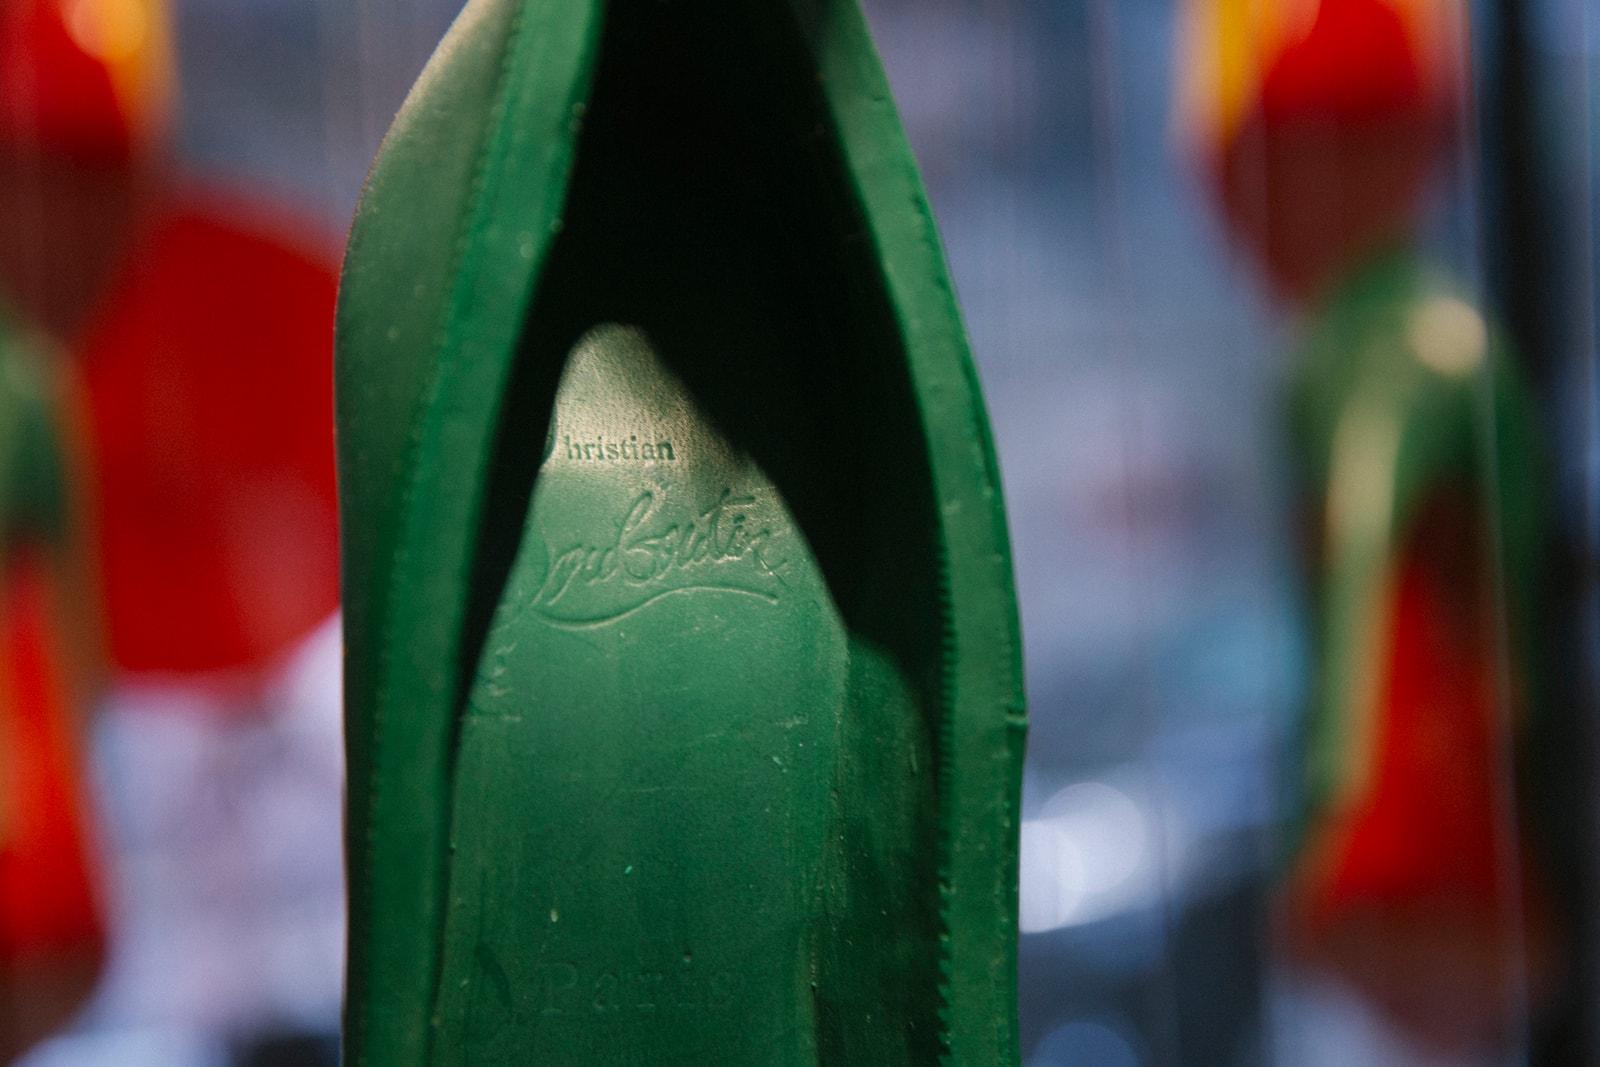 CJ Hendry Christian Louboutin Complimentary Colors Art Basel Exhibition